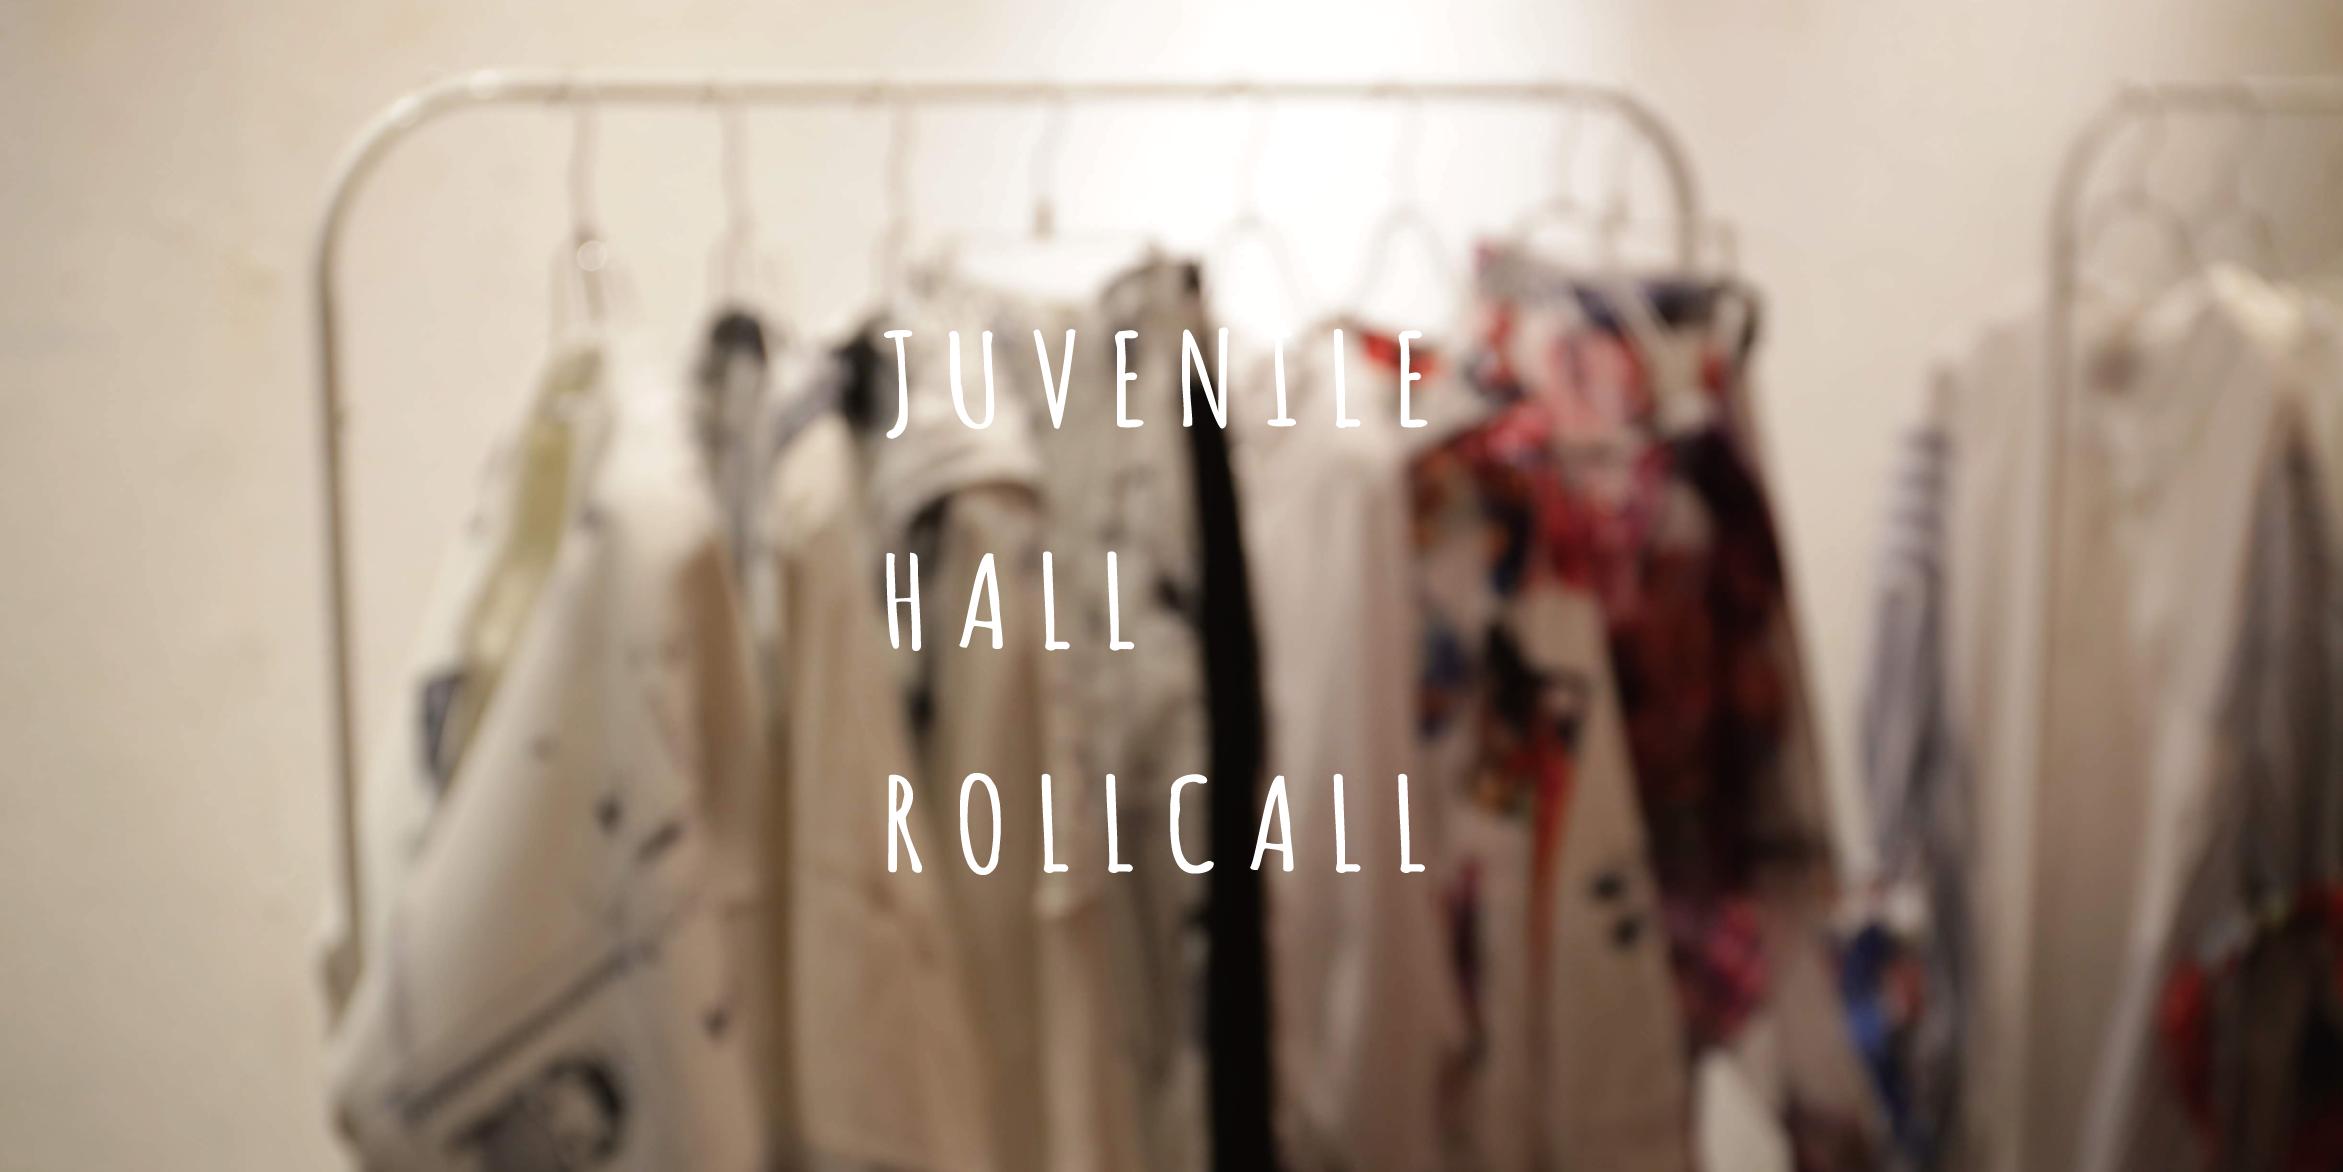 JUVENILE HALL ROLLCALL